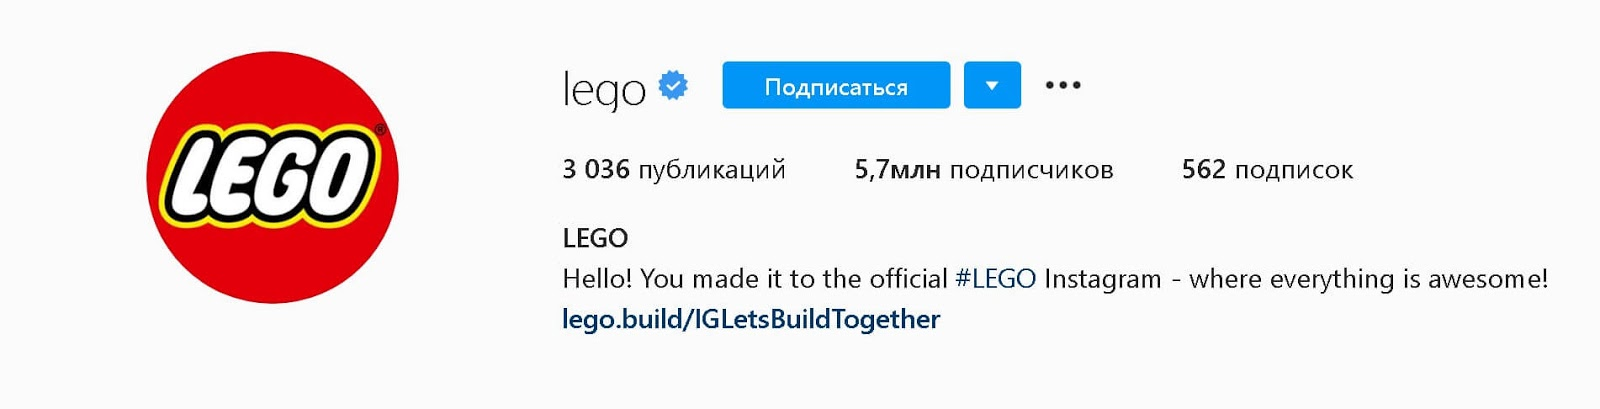 instagram-bios-lego